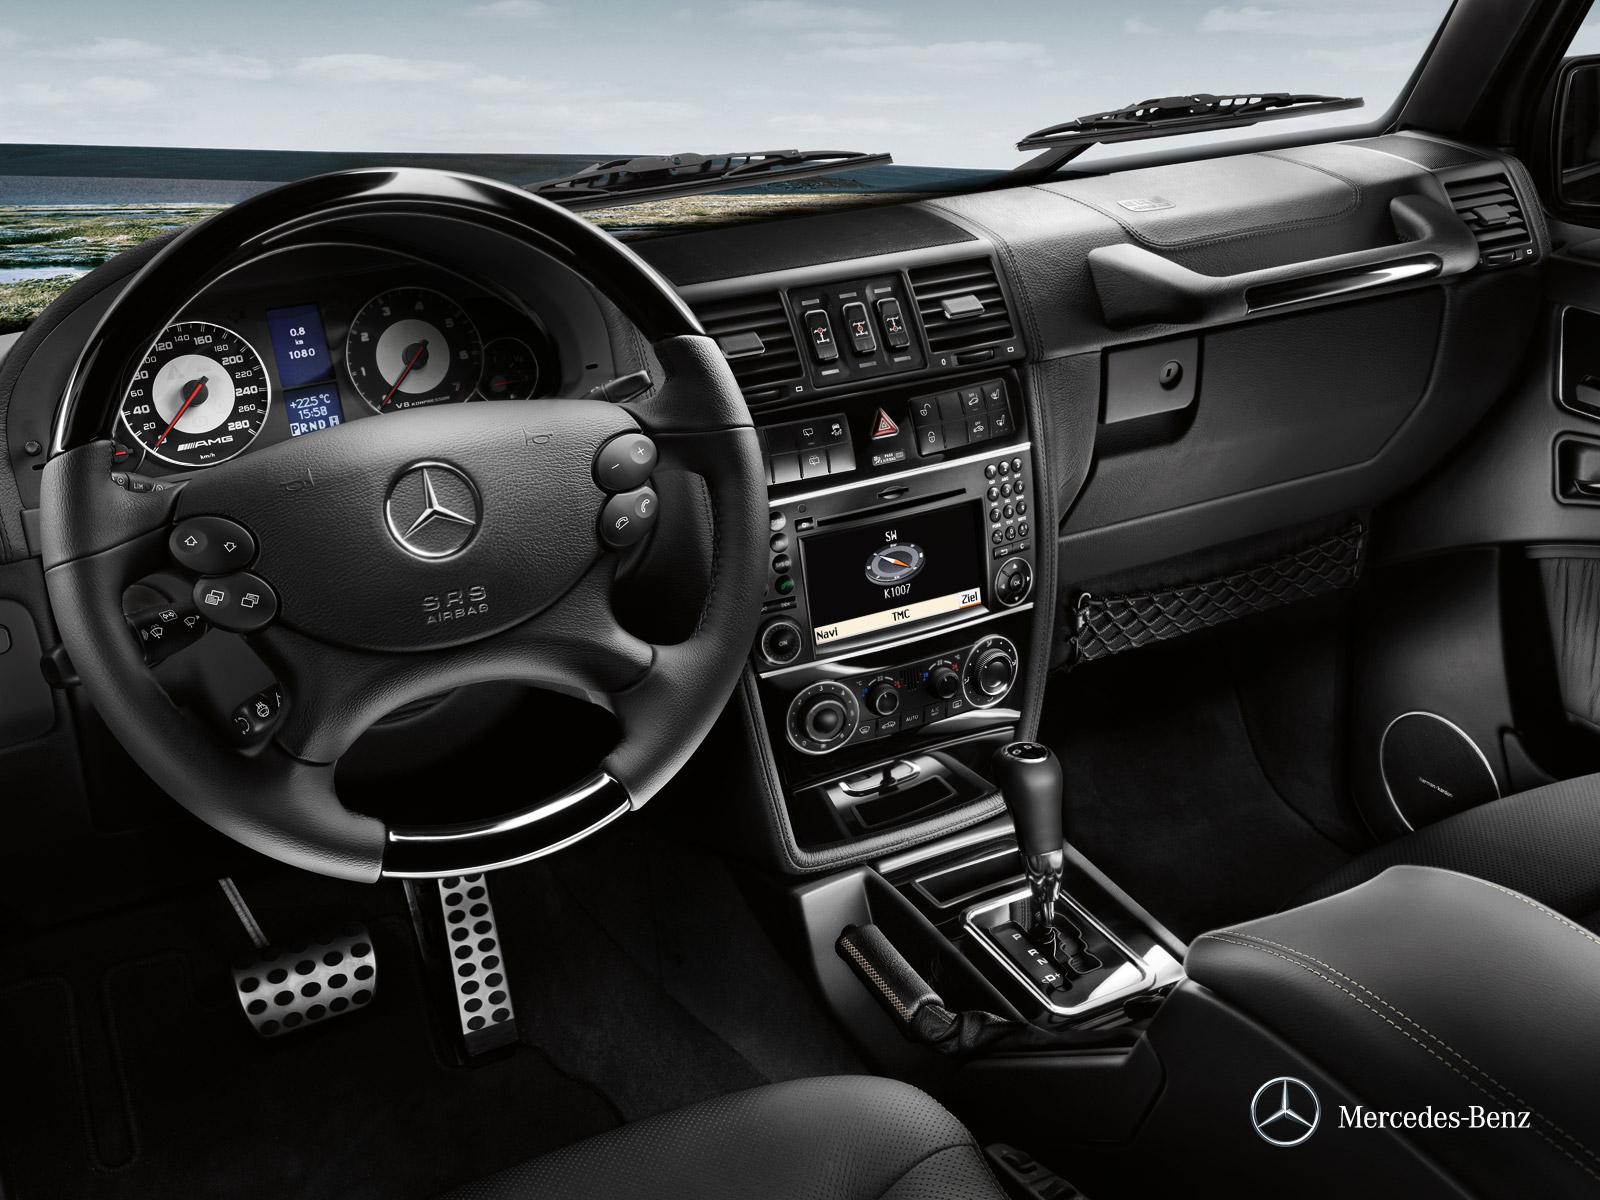 mercedes benz g klasse cabrio w463 2007 2008 2009 2010 2011 2012 autoevolution. Black Bedroom Furniture Sets. Home Design Ideas